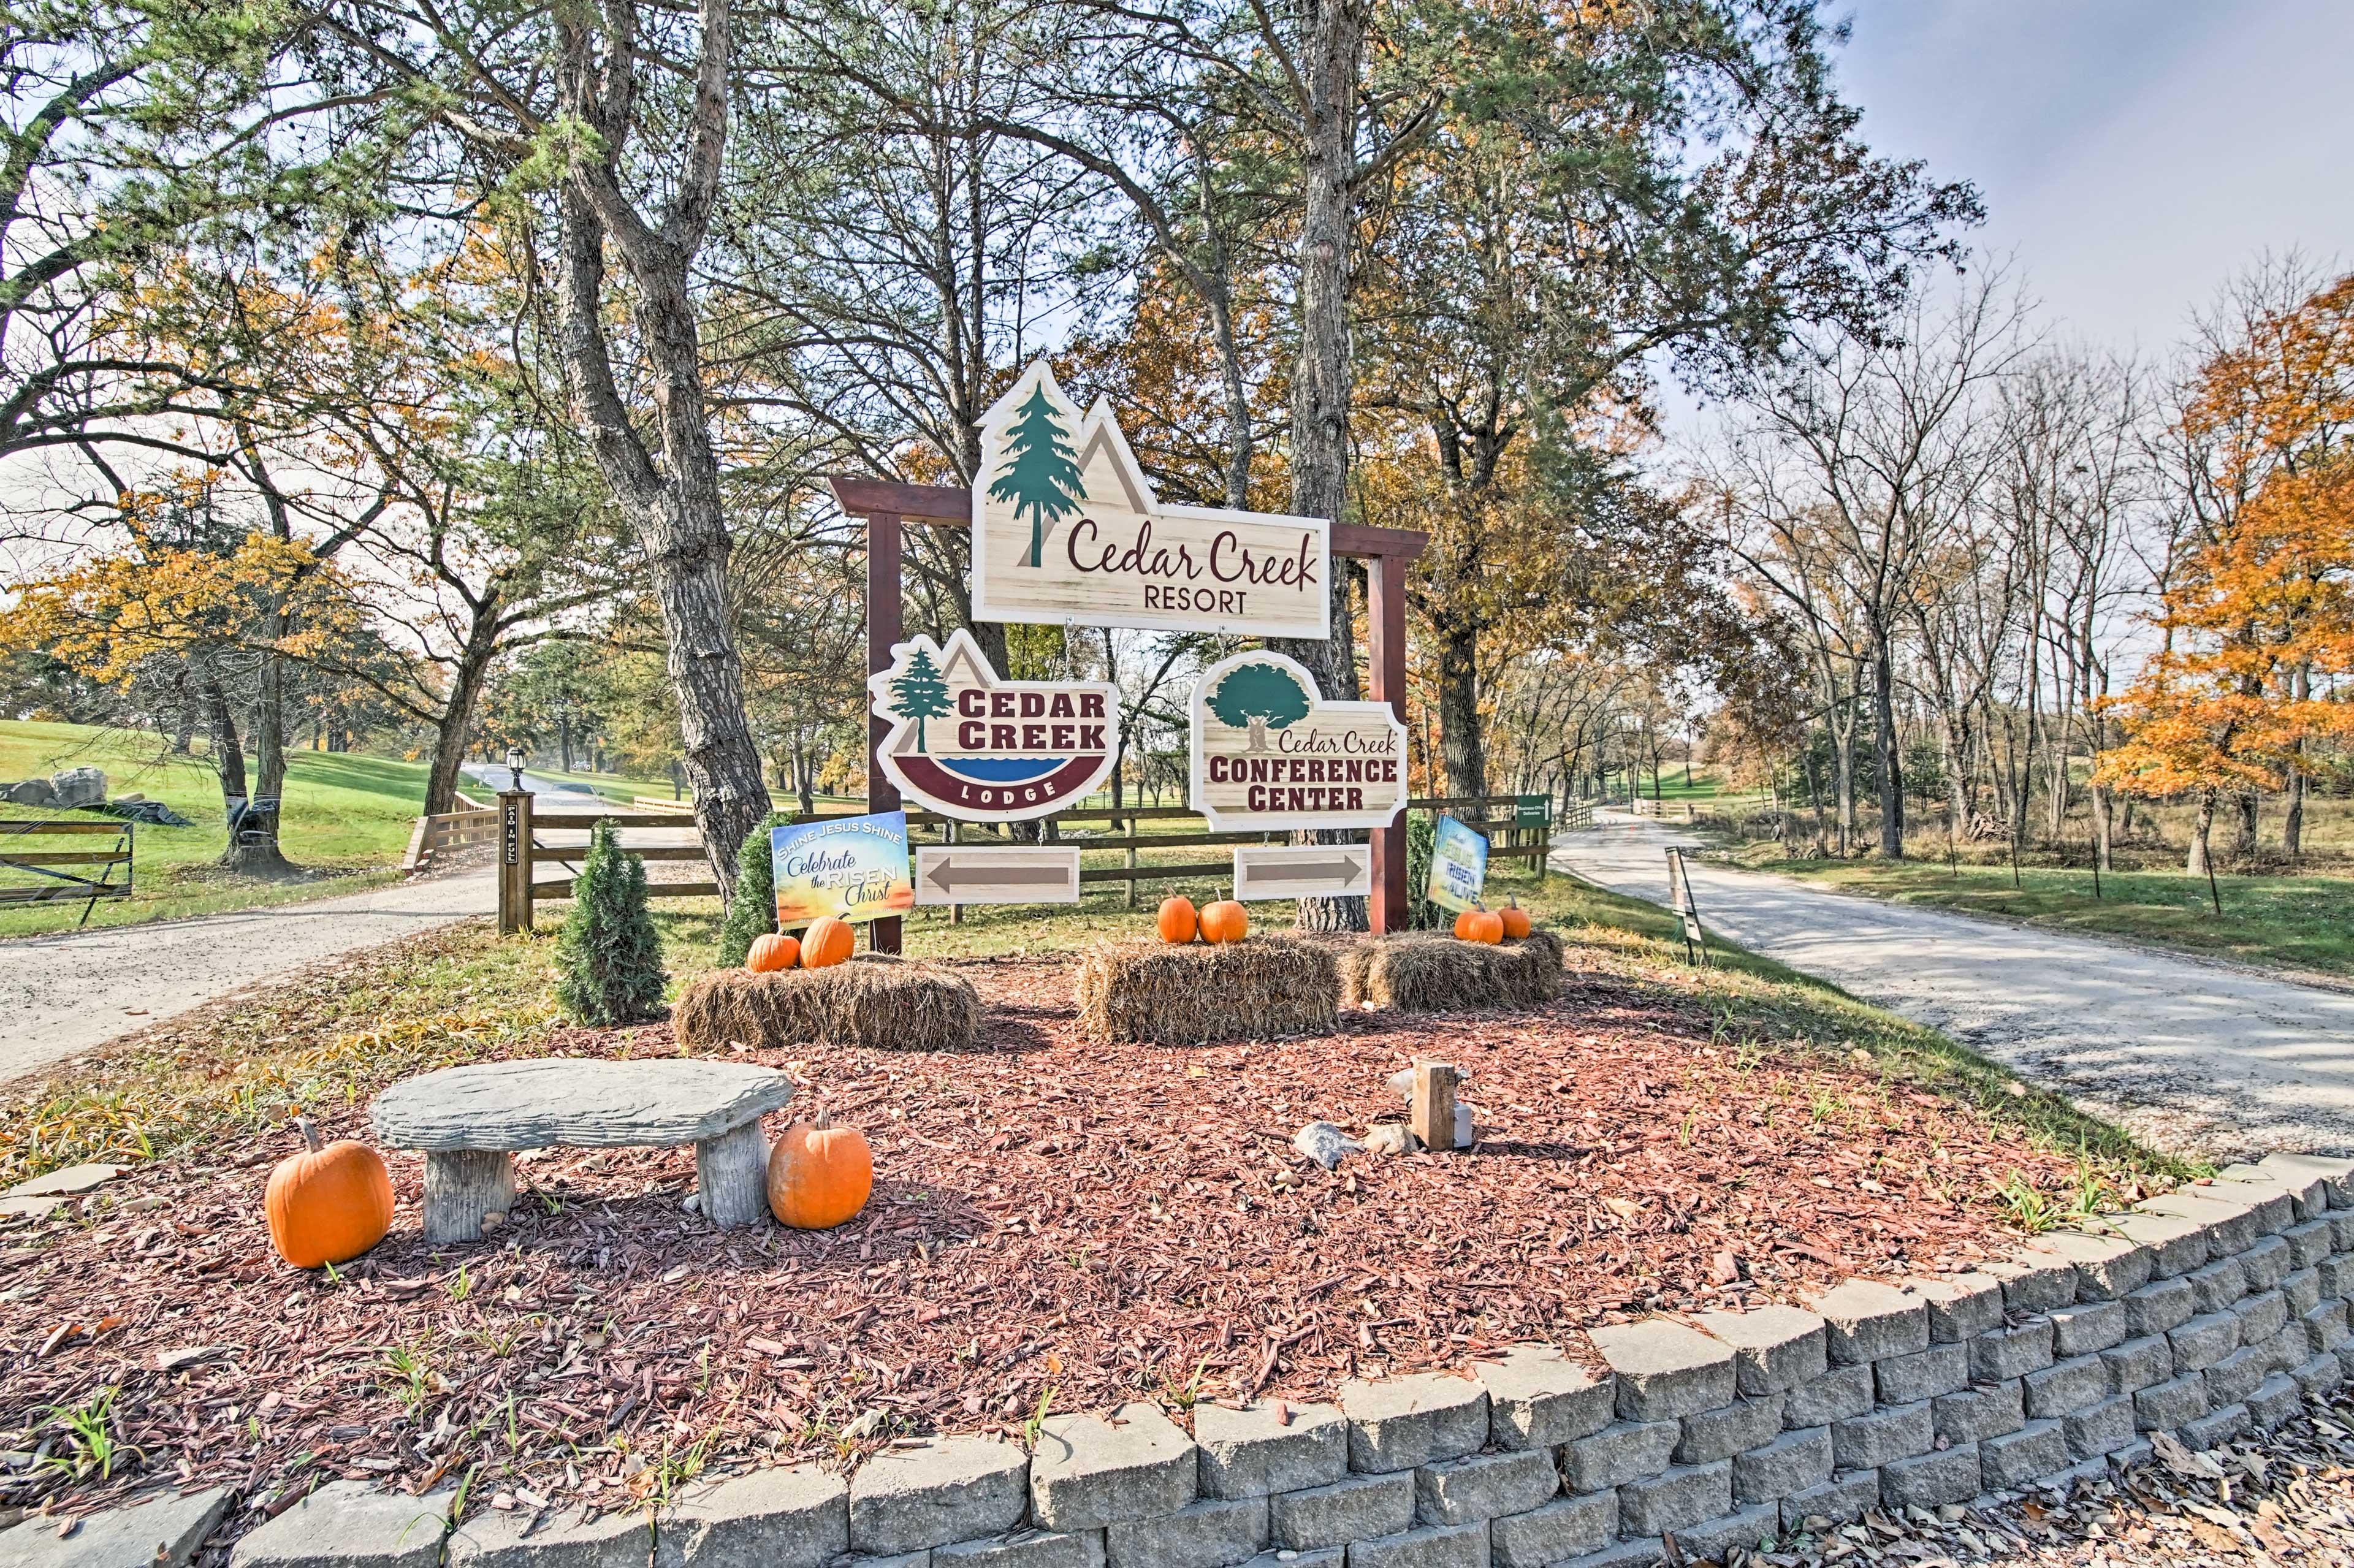 Located in Cedar Creek Resort, this cabin is steps from outdoor activities!